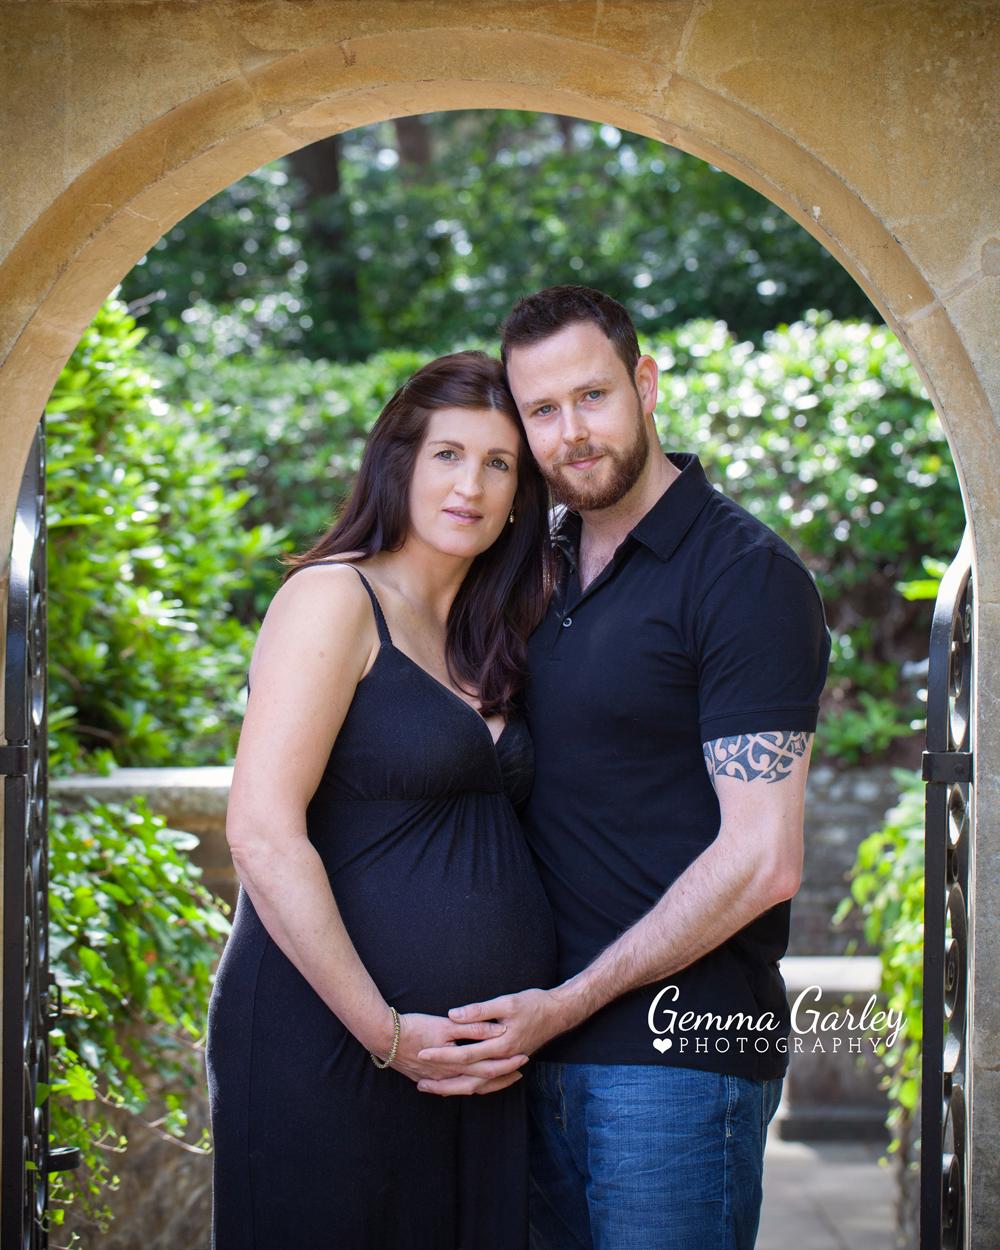 pregnancy maternity-photography-bournemouth-poole-dorset-gemma-garley-photography copy.jpg